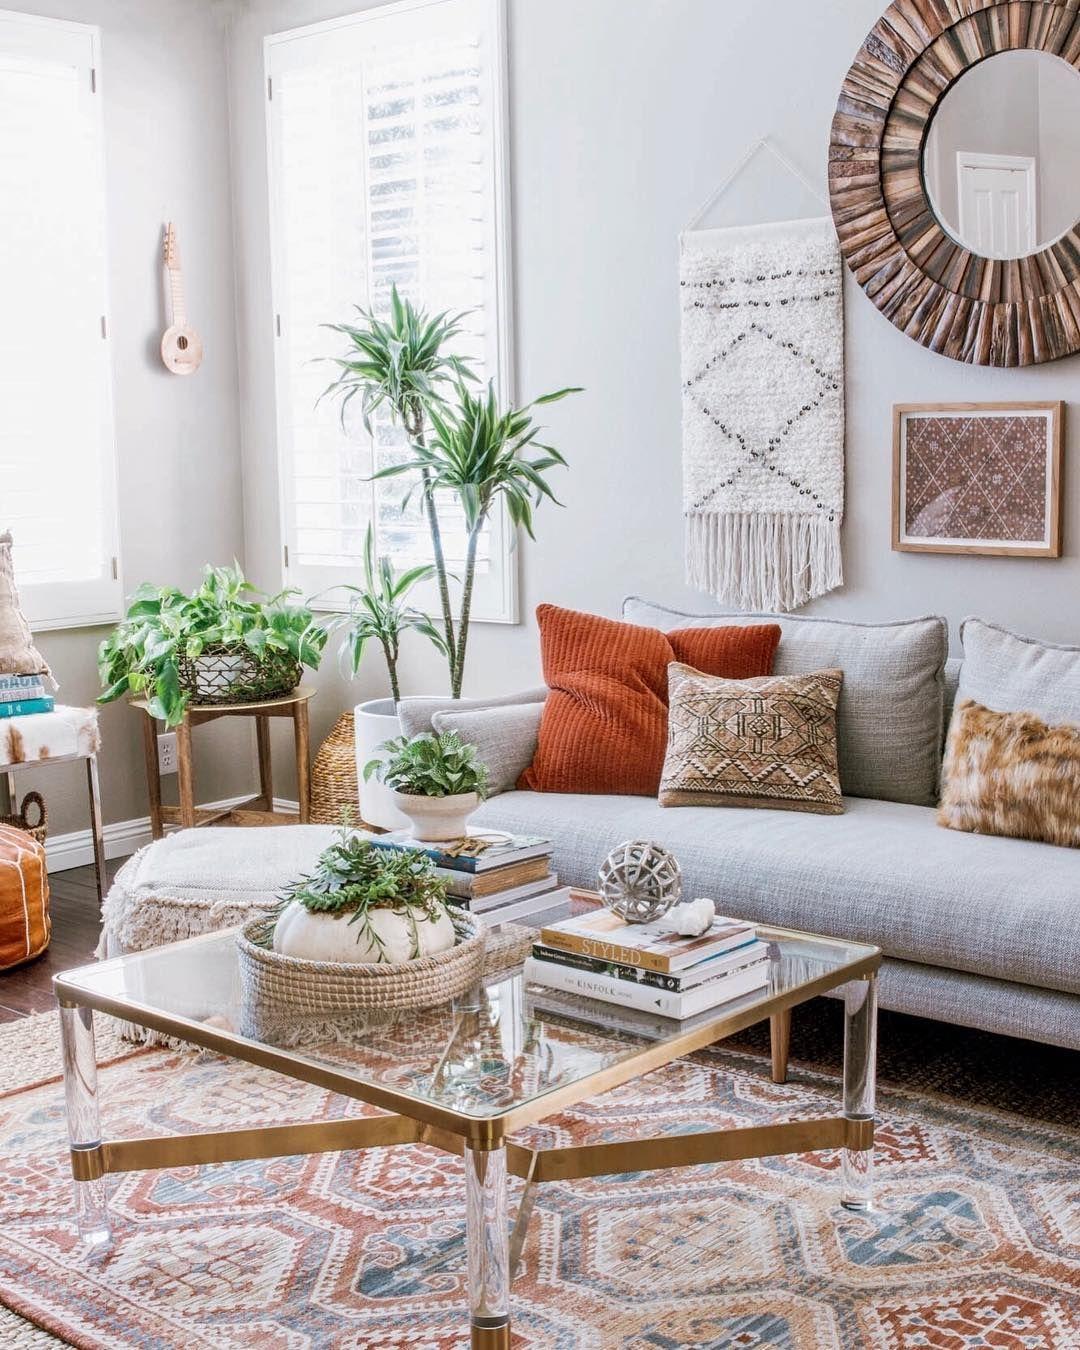 Anita Yokota Blog Interior Design Career Path Interview